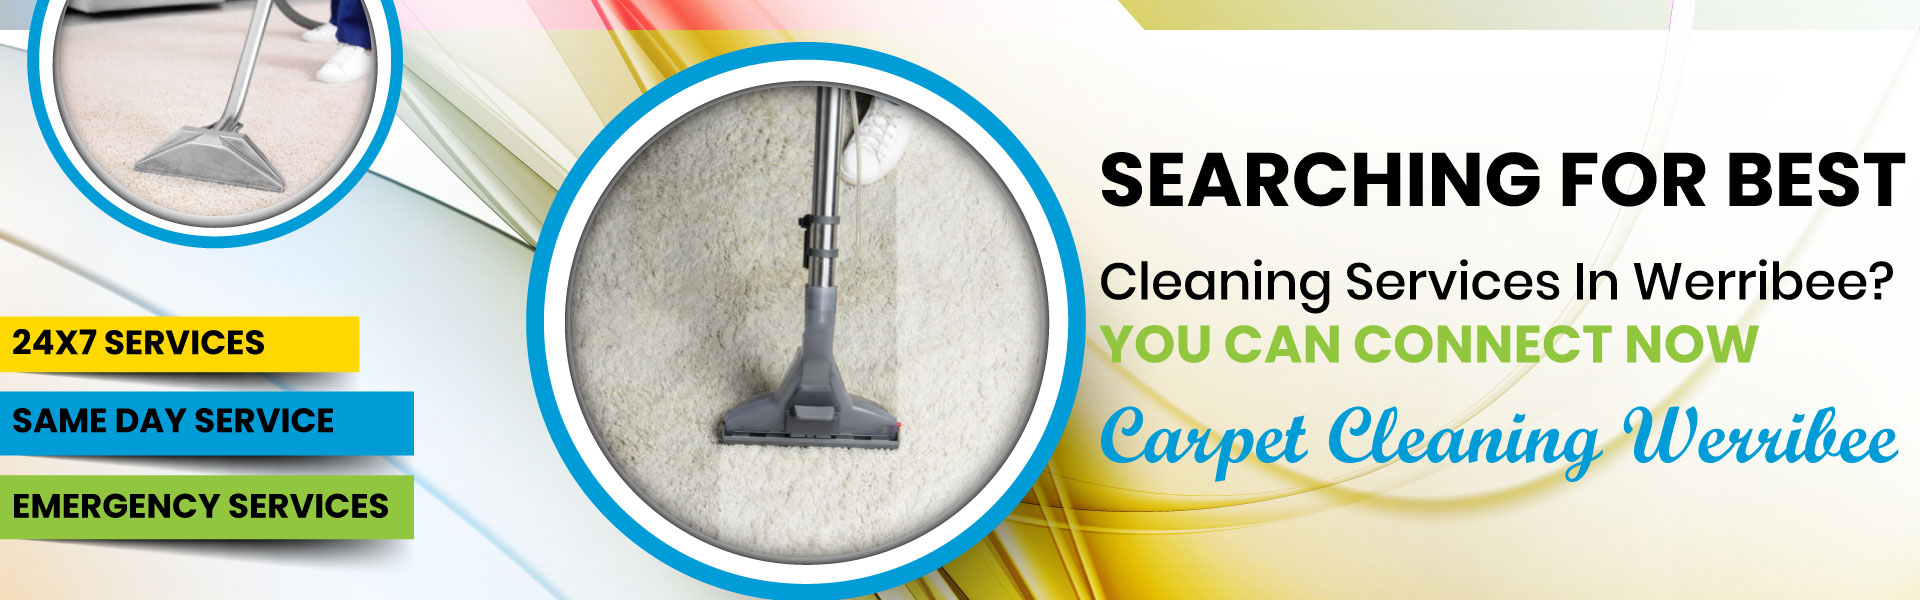 Carpet Cleaning Werribee